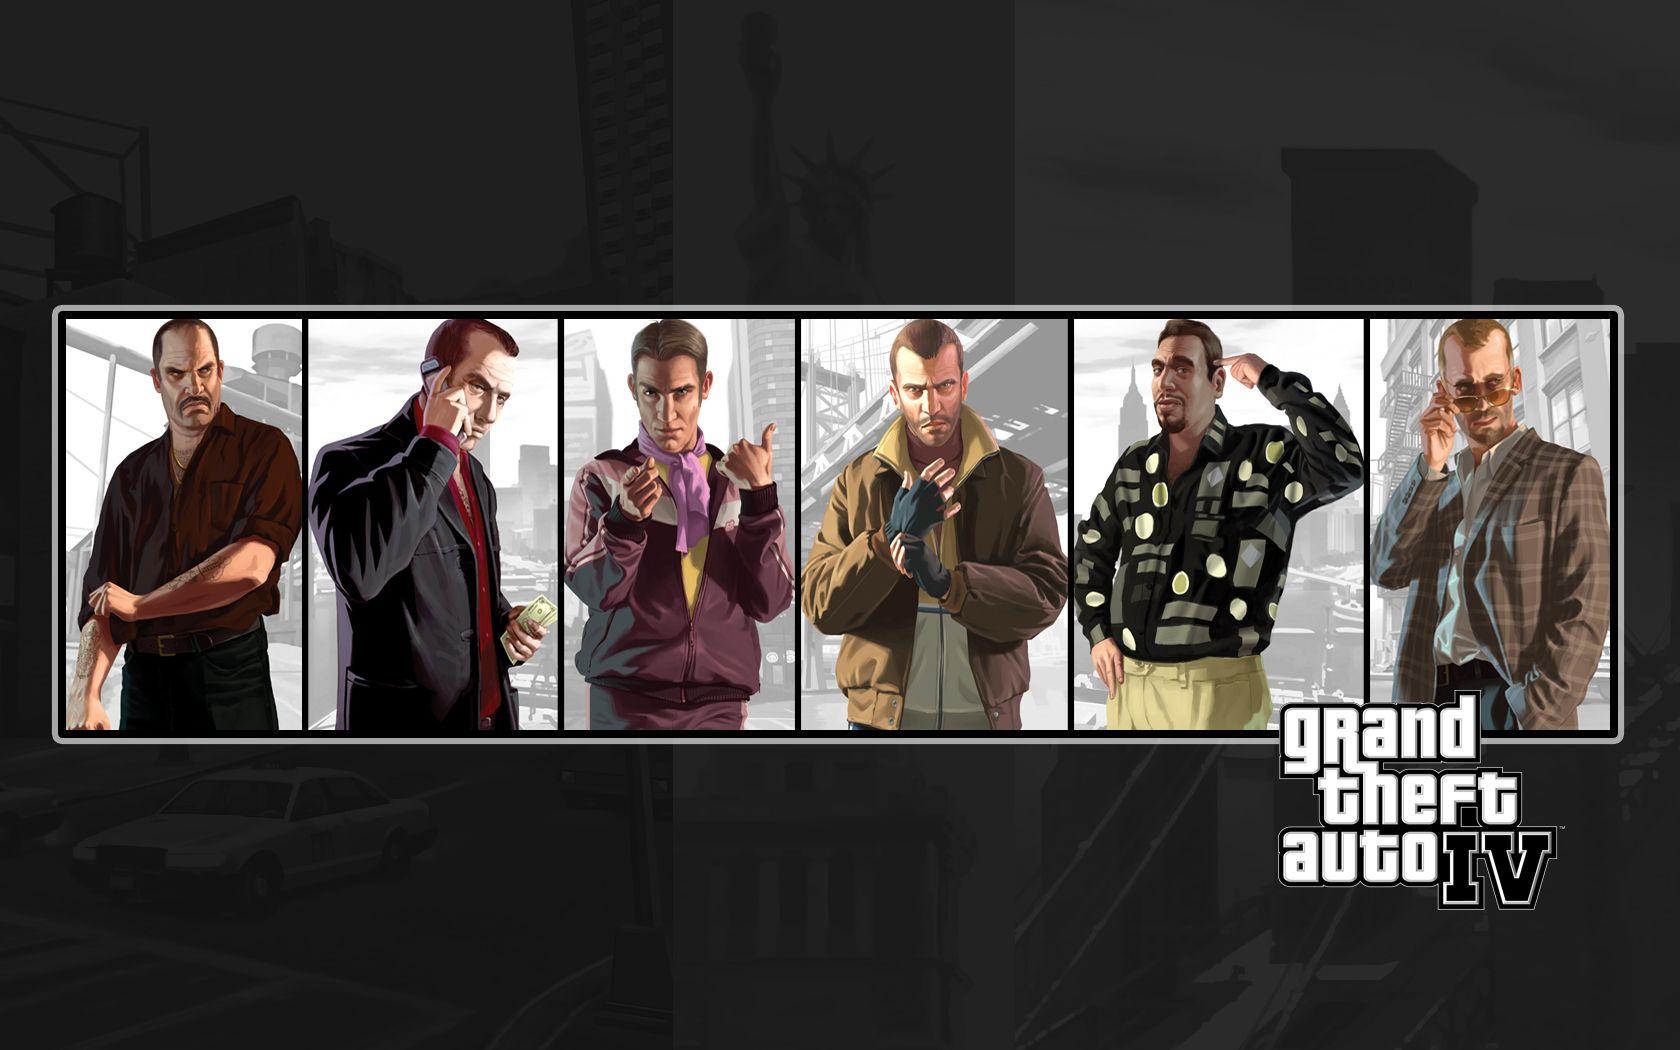 Gta 5 Wallpaper 252077 Grand Theft Auto Grand Theft Auto 4 Action Adventure